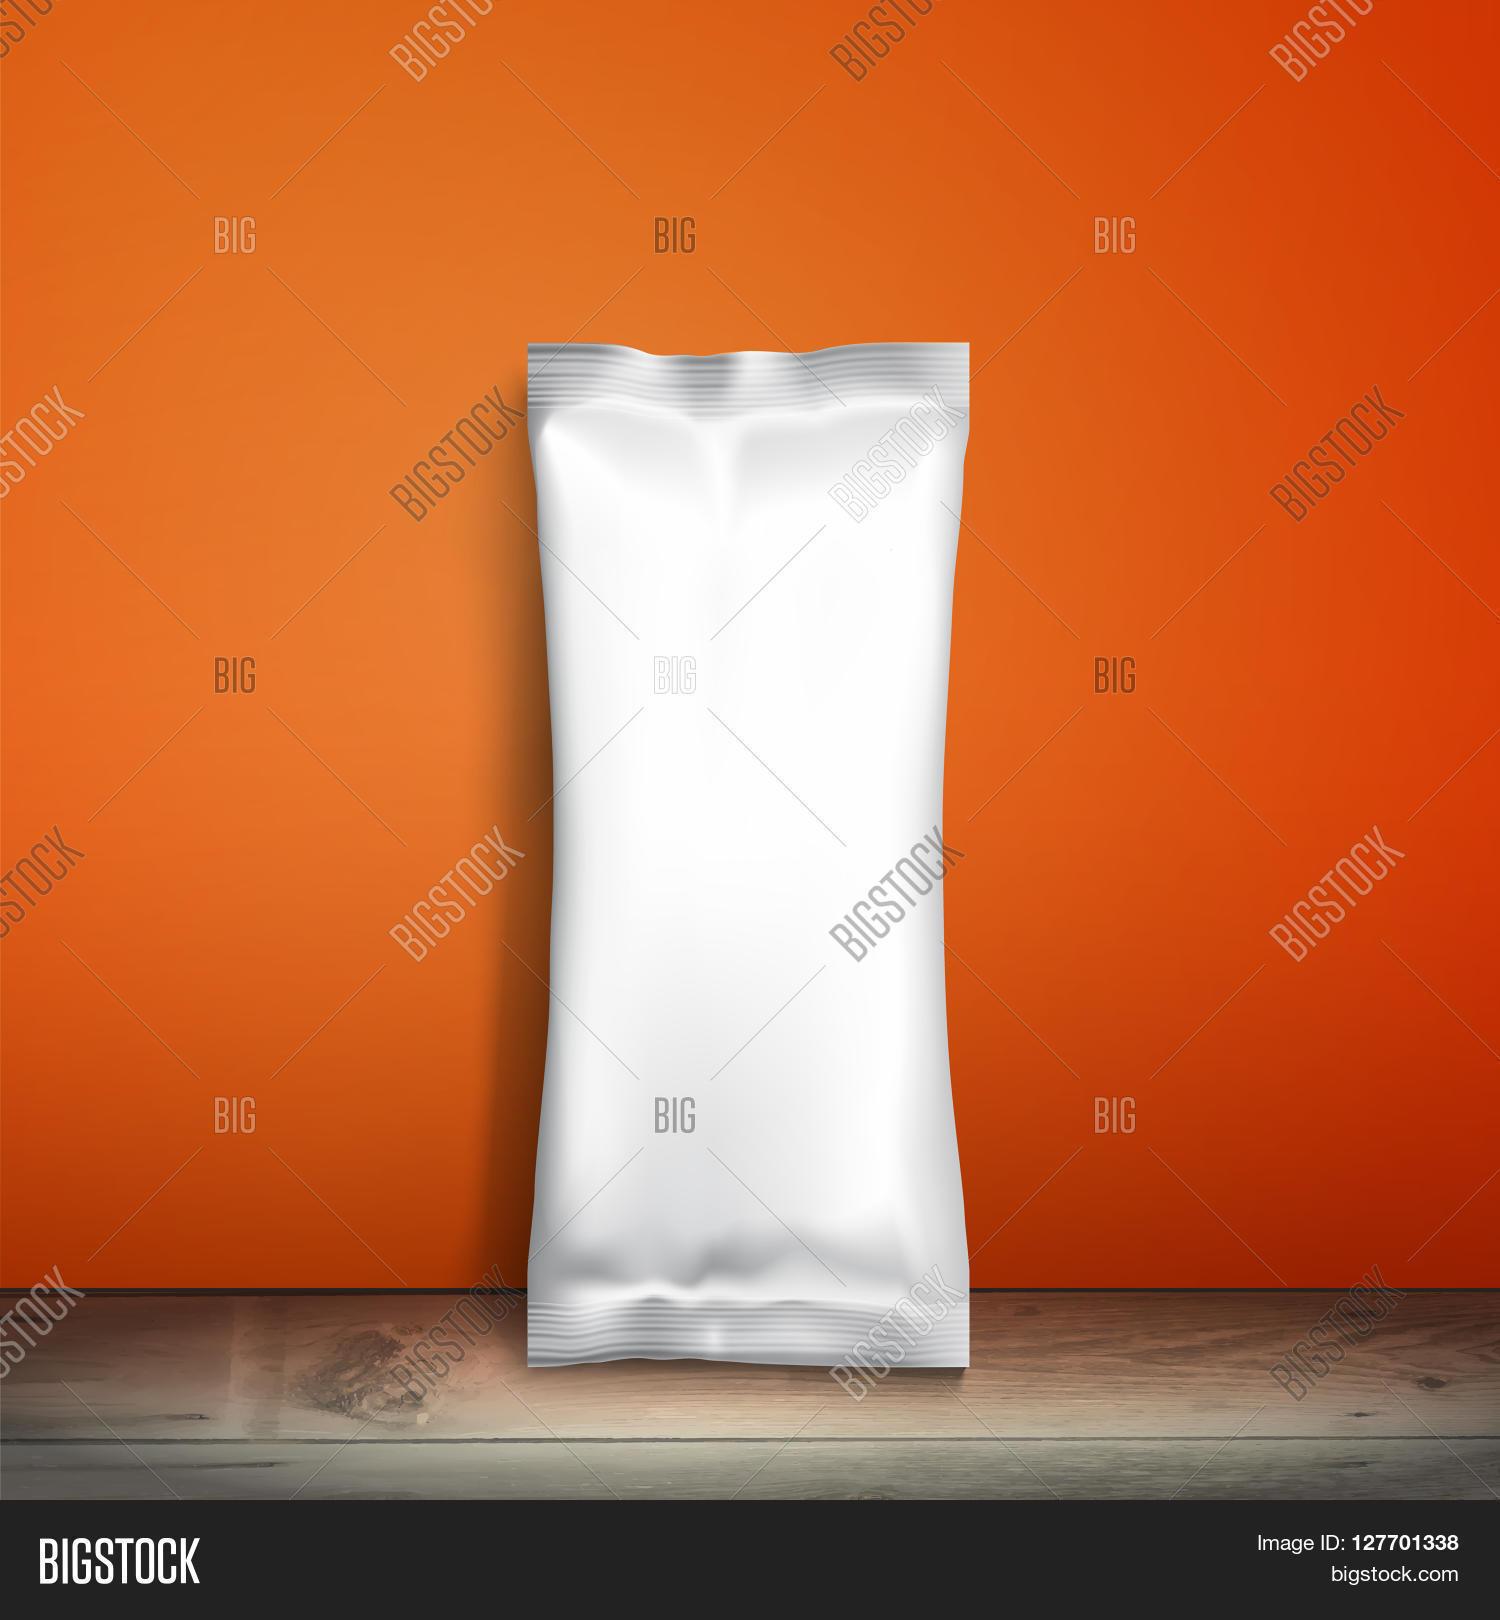 Blank White 3d Image & Photo (Free Trial)   Bigstock